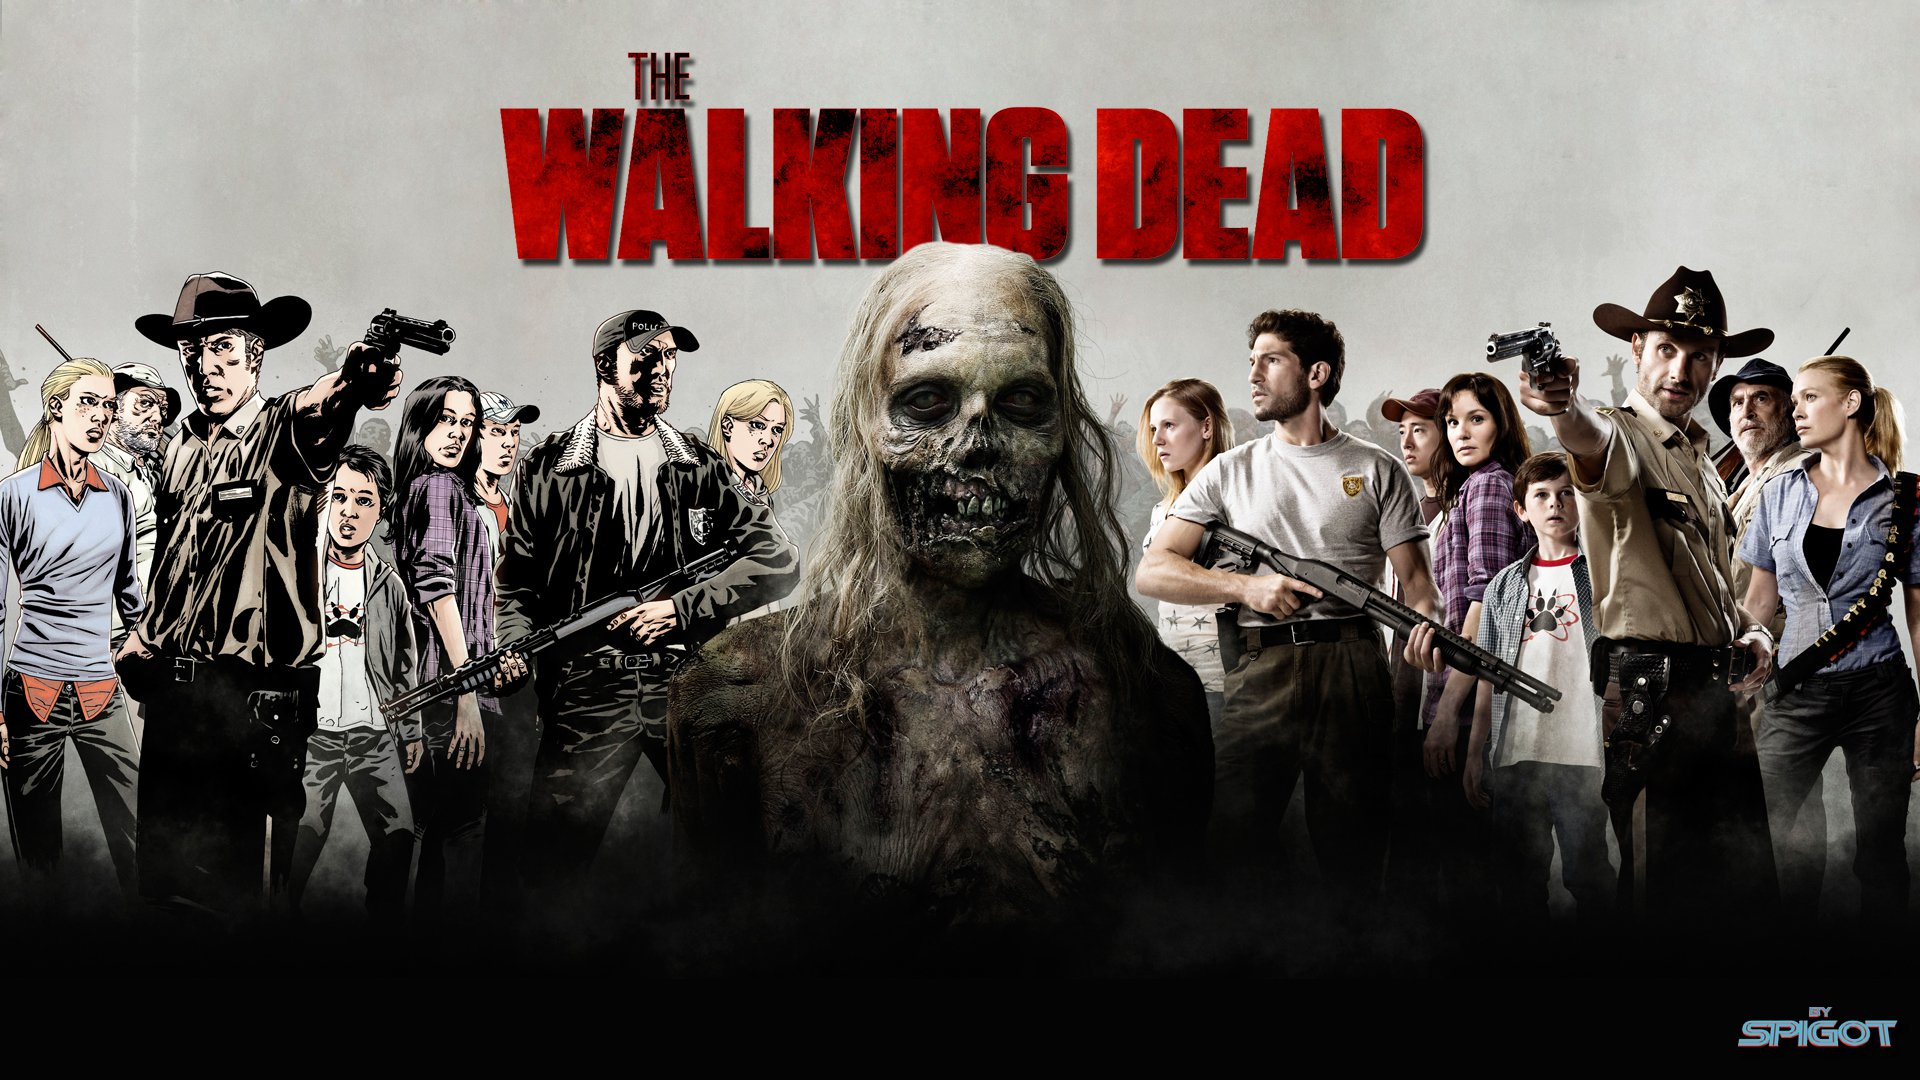 The Walking Dead wallpapers HD Video Musical De TWD   Taringa 1920x1080